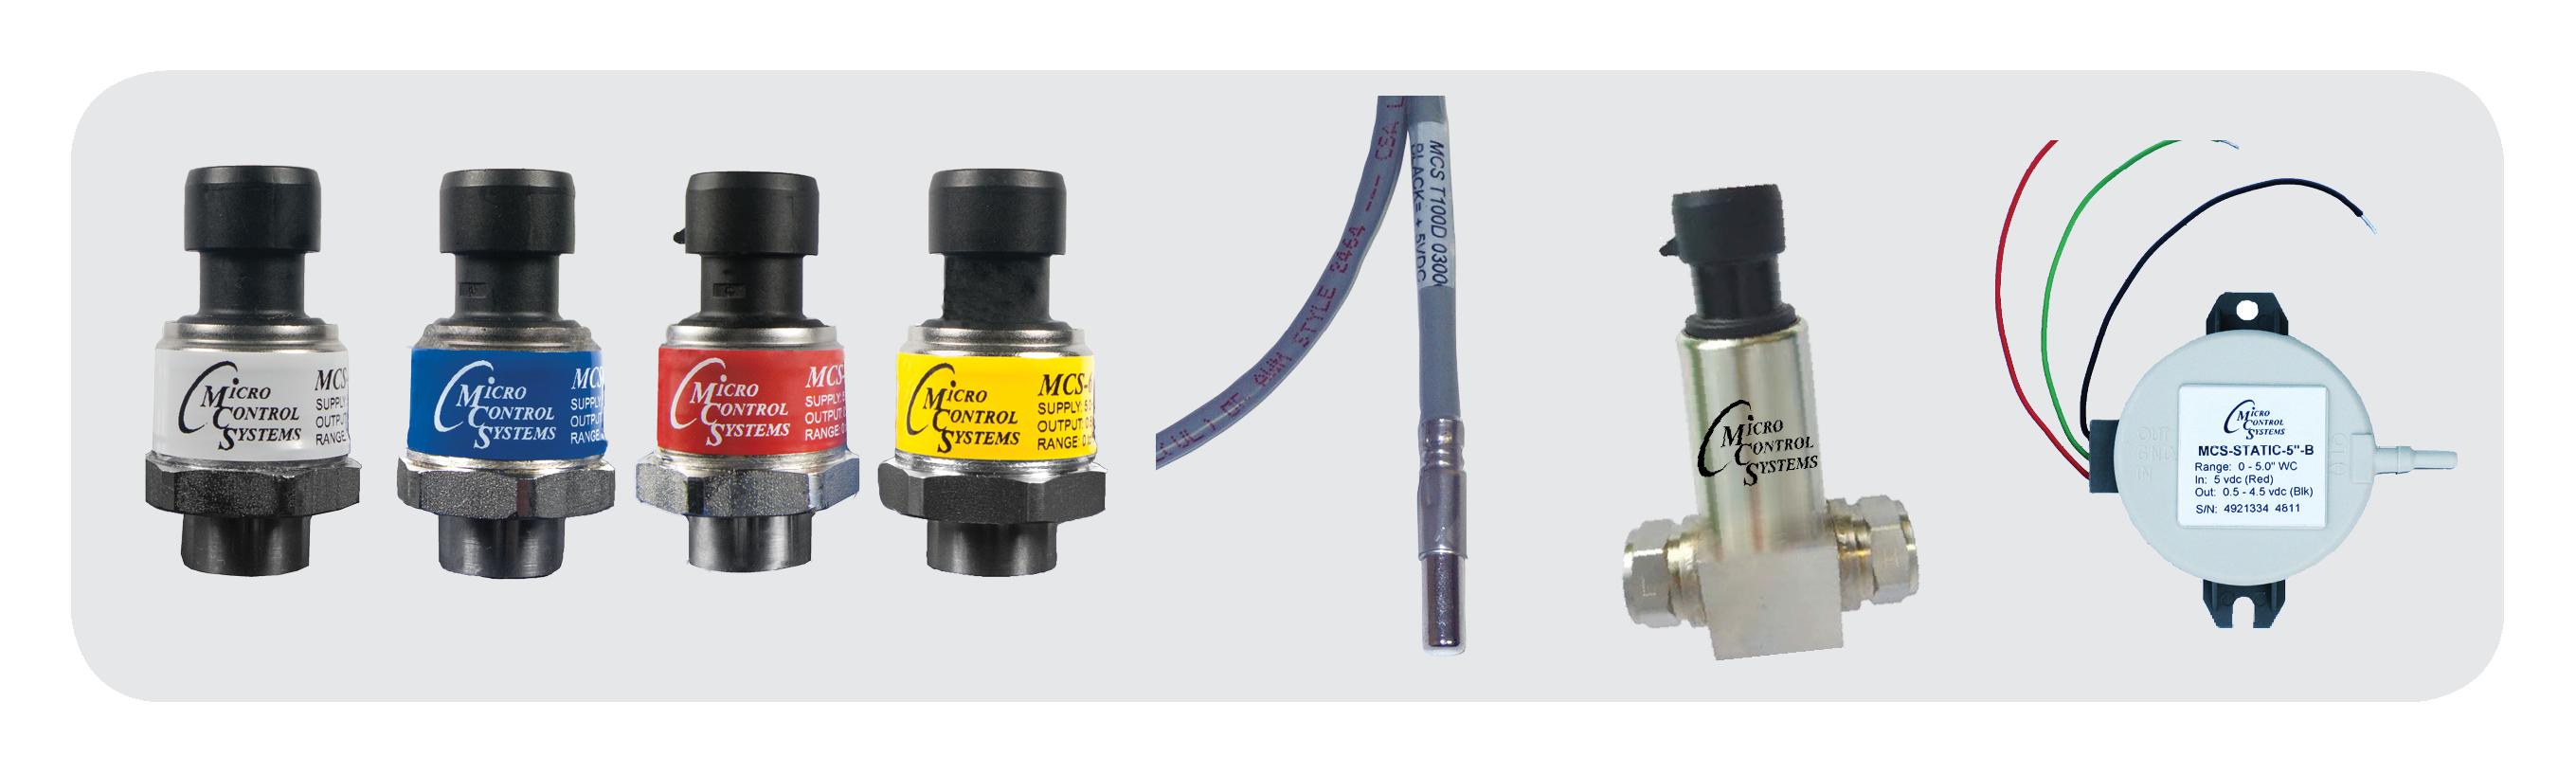 Micro Control Systems MCS-T100-20 Temperature Sensor